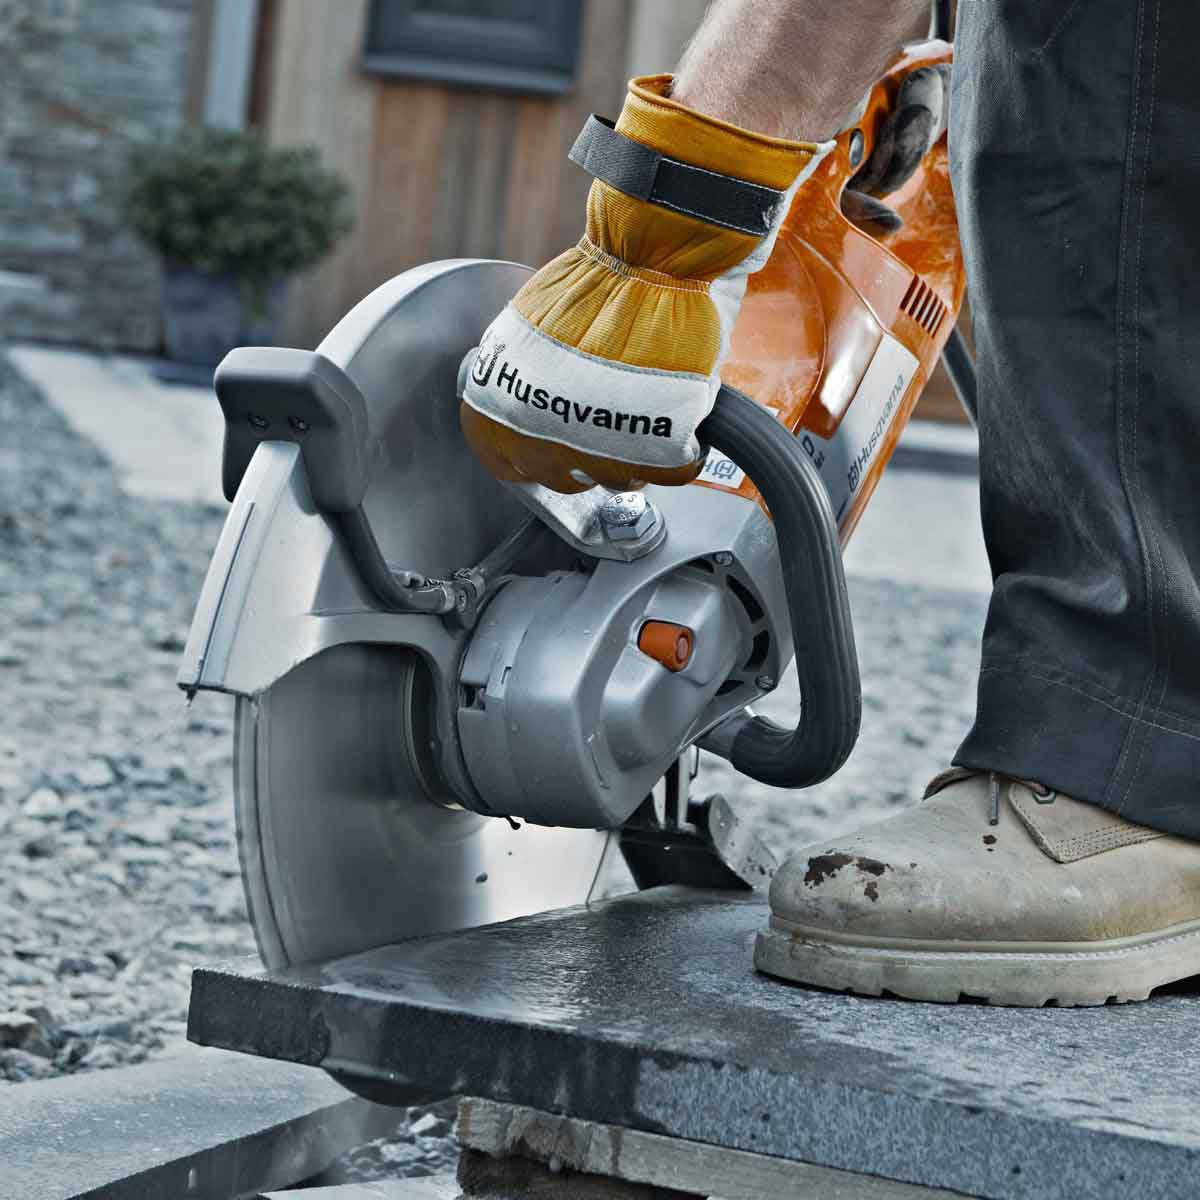 Husqvarna K3000 Wet cutting granite